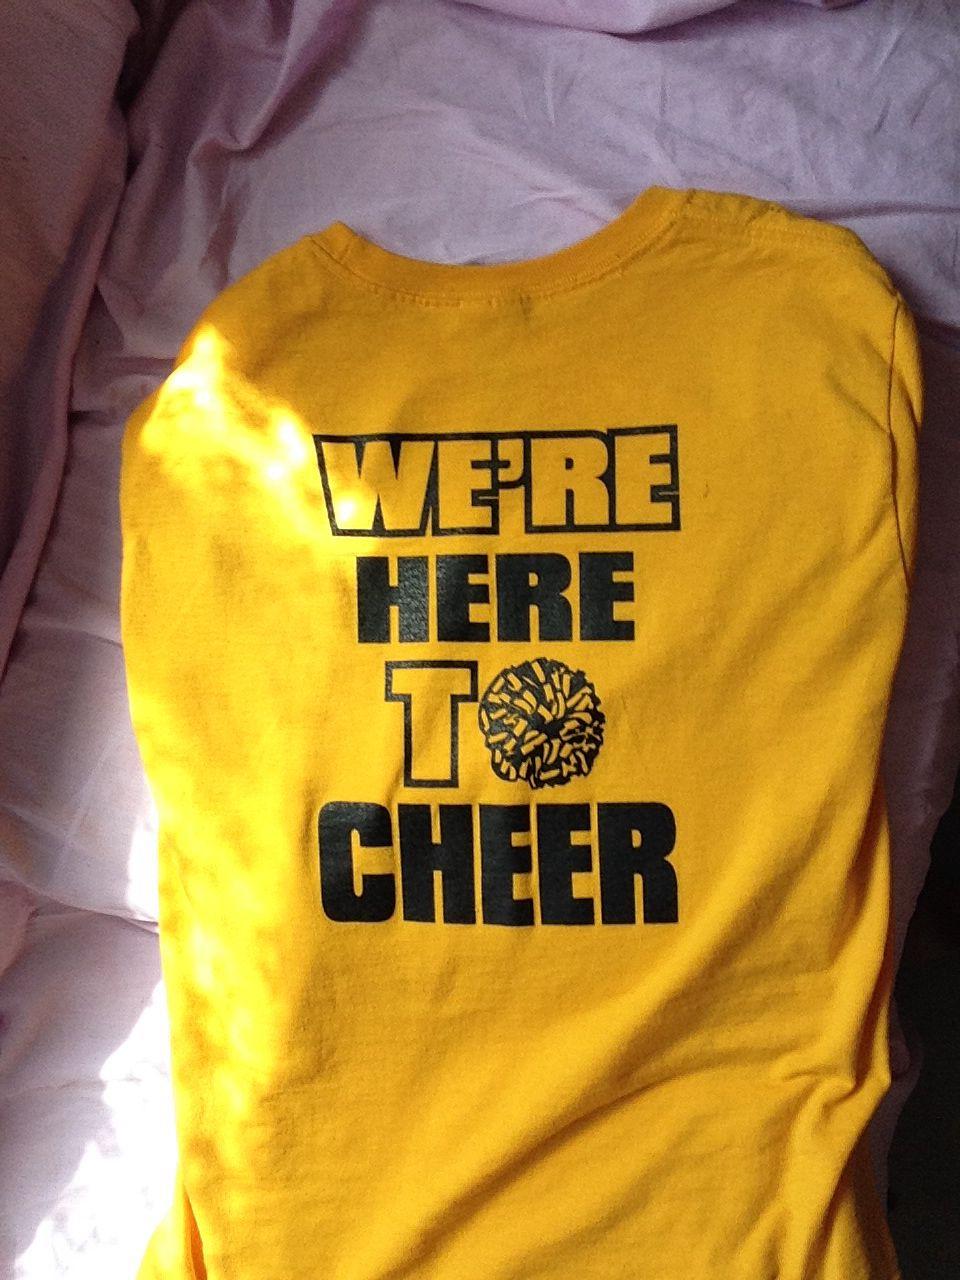 My cheer shirt(back)   Cheer shirts, Cheerleading shirts ...